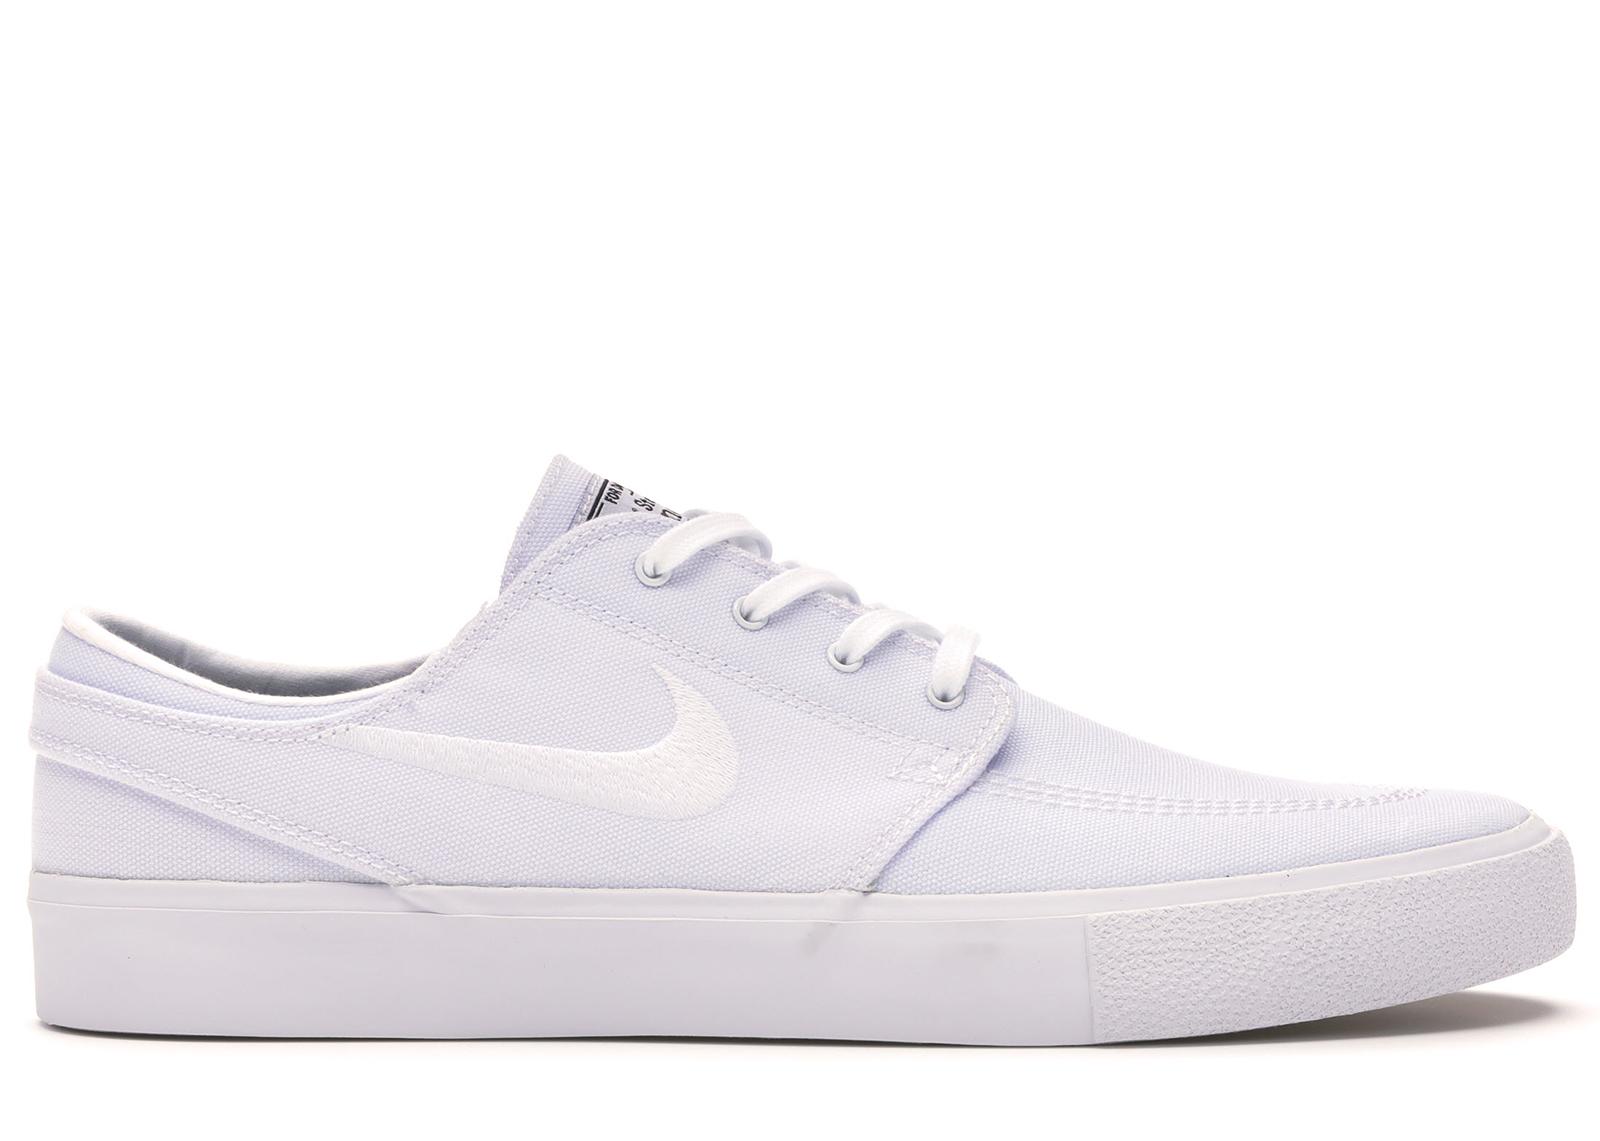 Nike SB Zoom Stefan Janoski Canvas RM White - AR7718-100